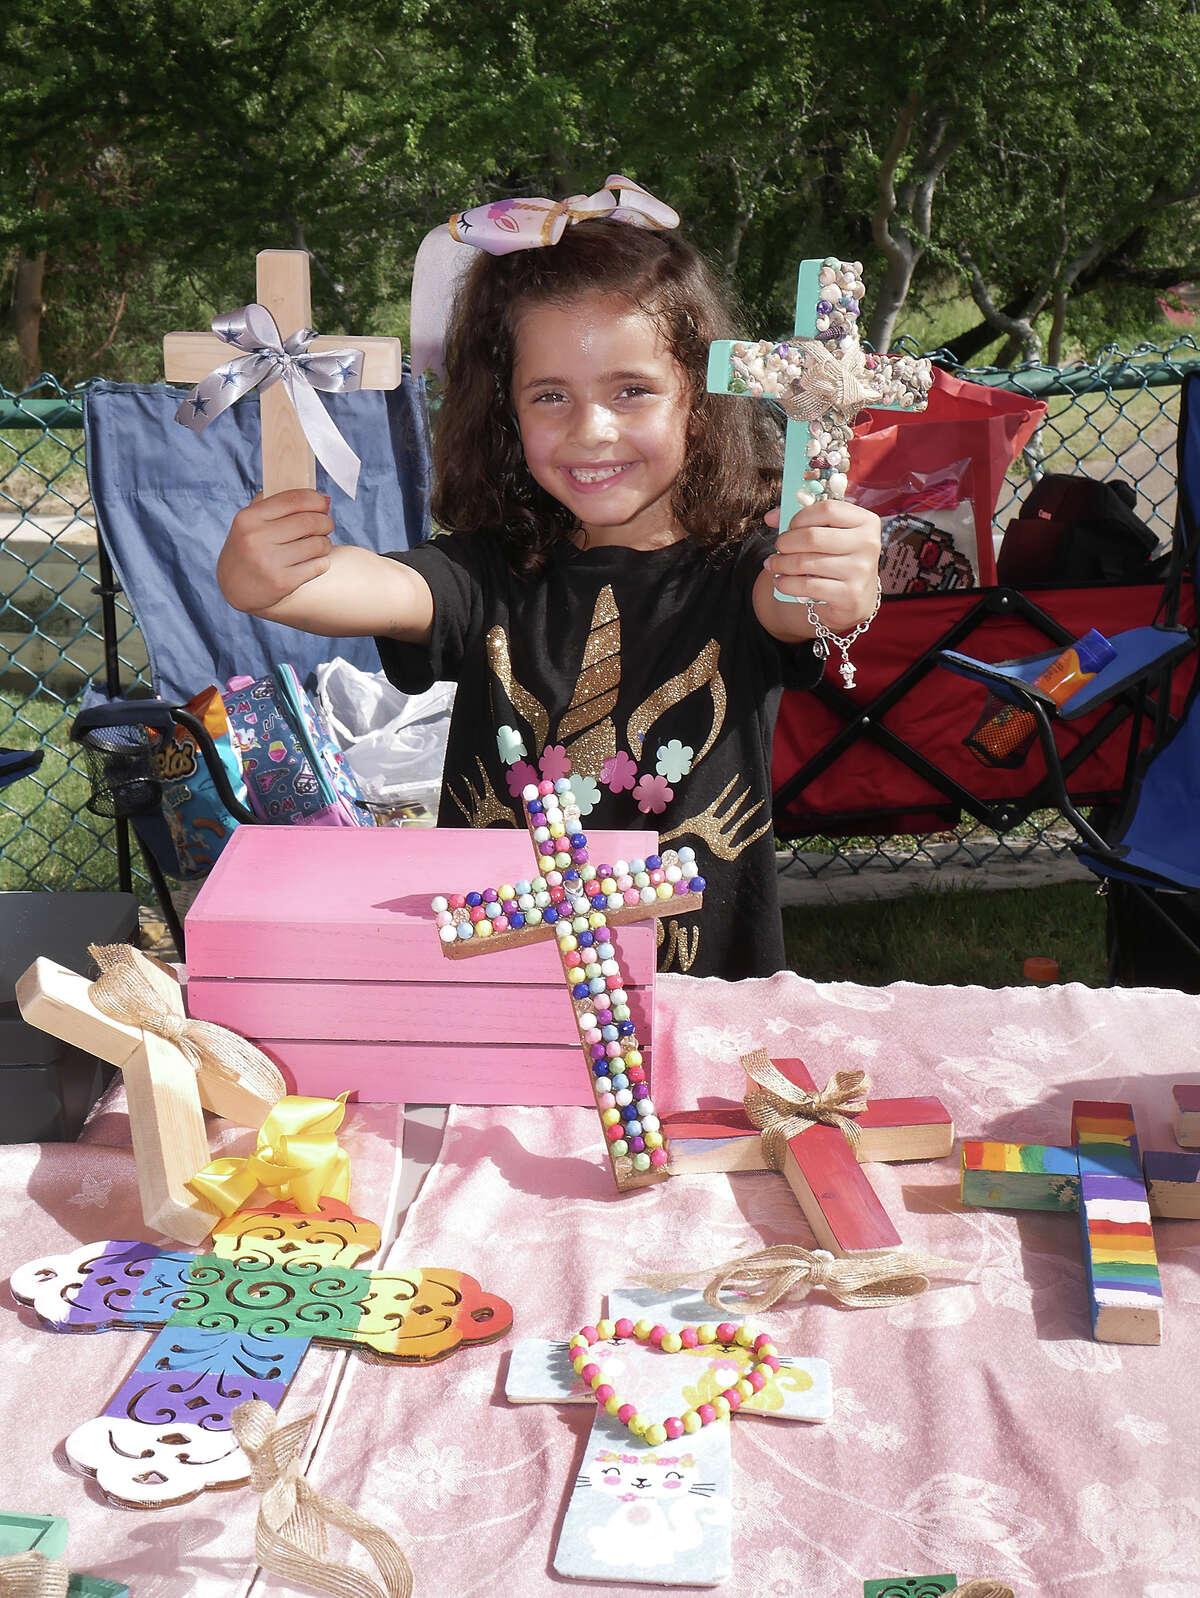 Laredoans at the Laredo Kids Fair at North Central Park, Saturday, June 29, 2019.